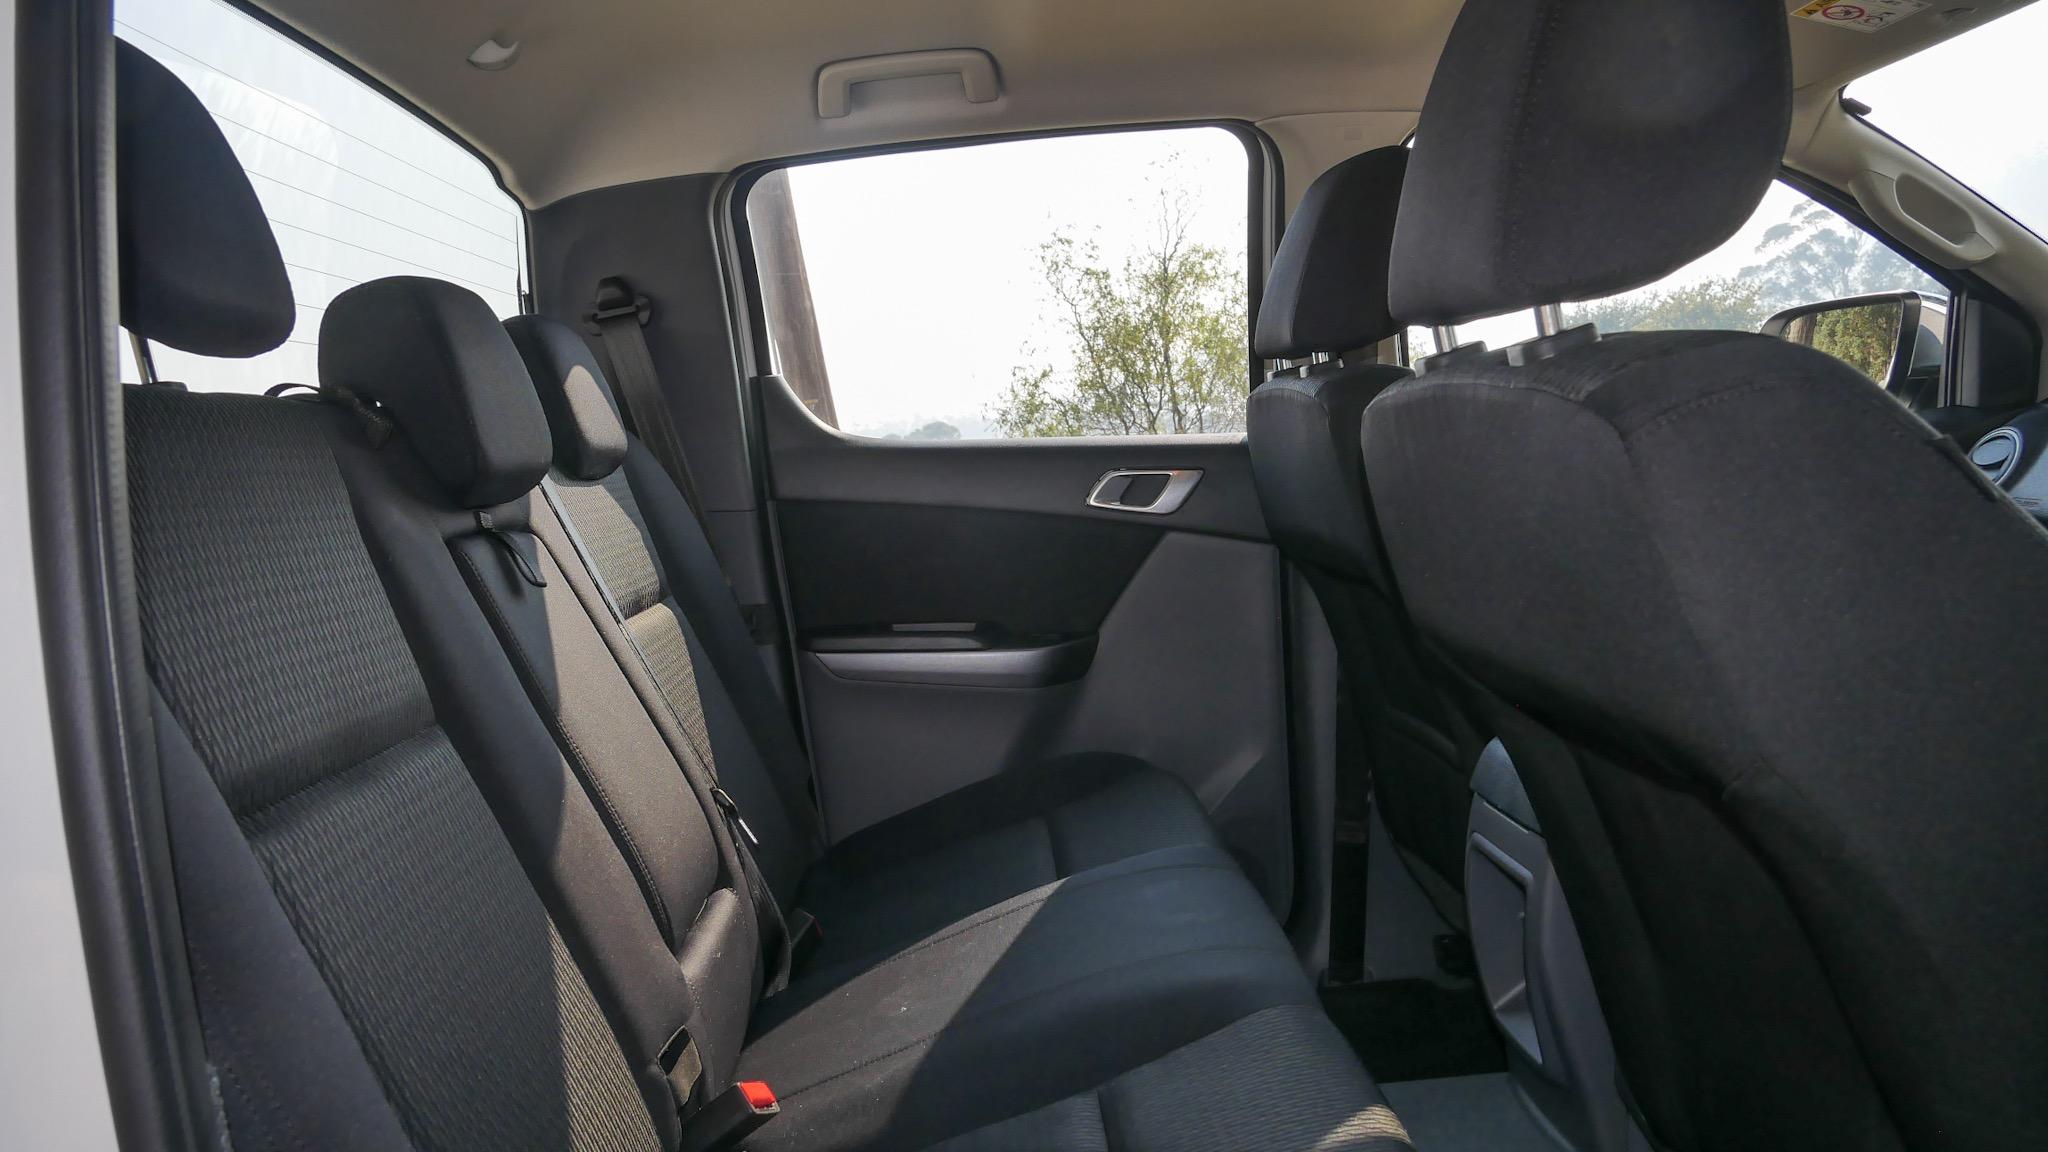 2018 Mazda BT-50 ute